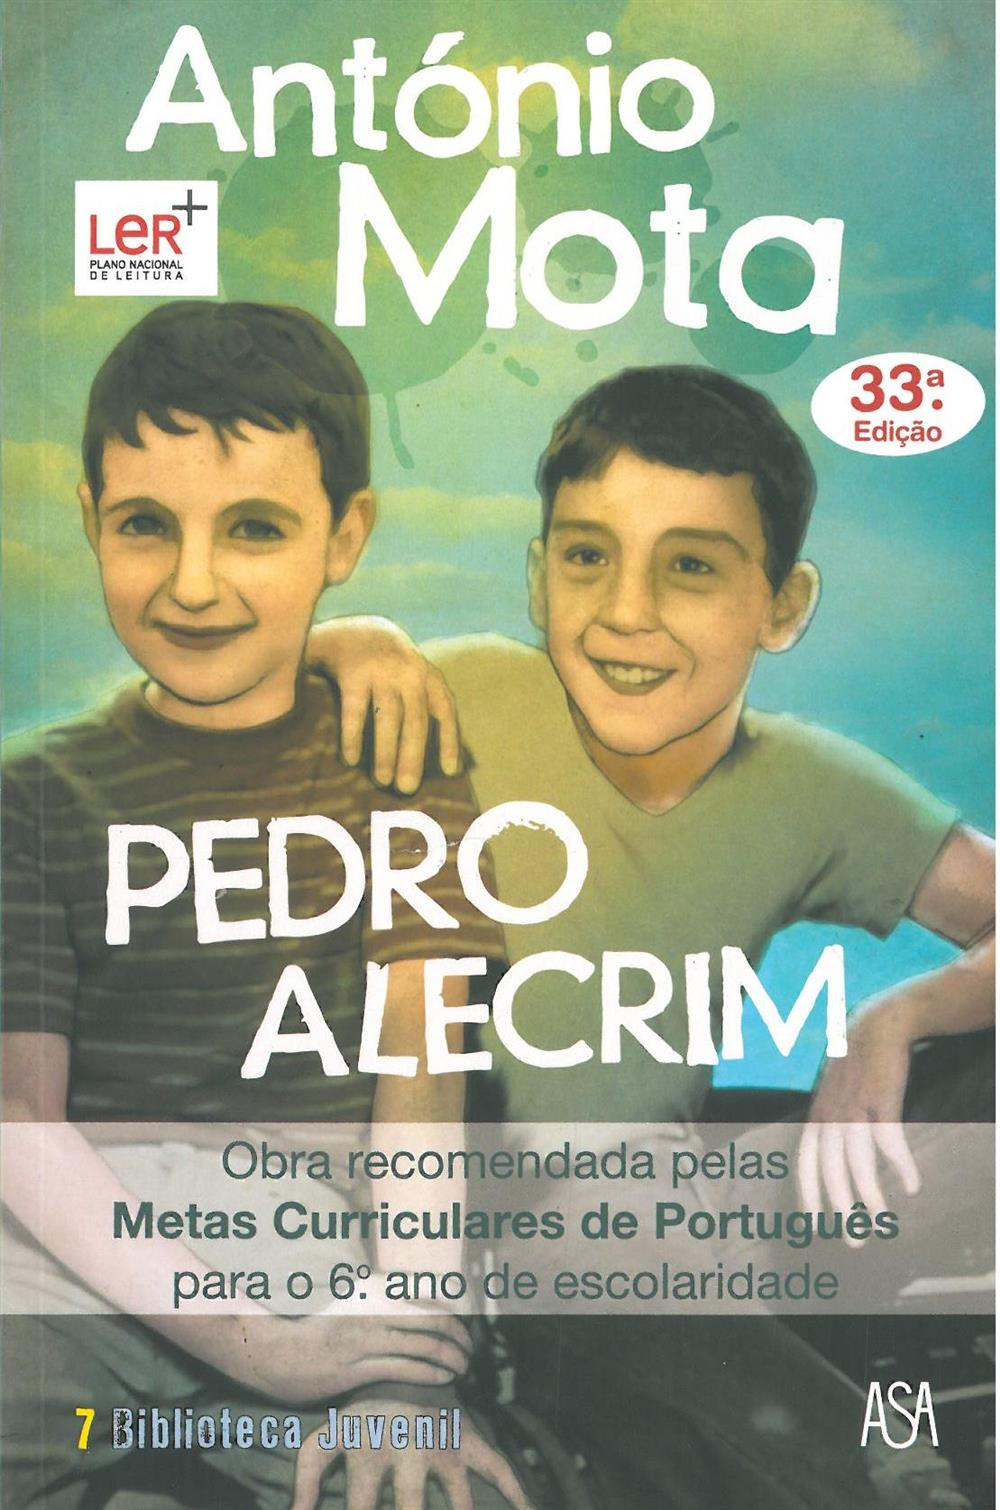 Pedro Alecrim_.jpg